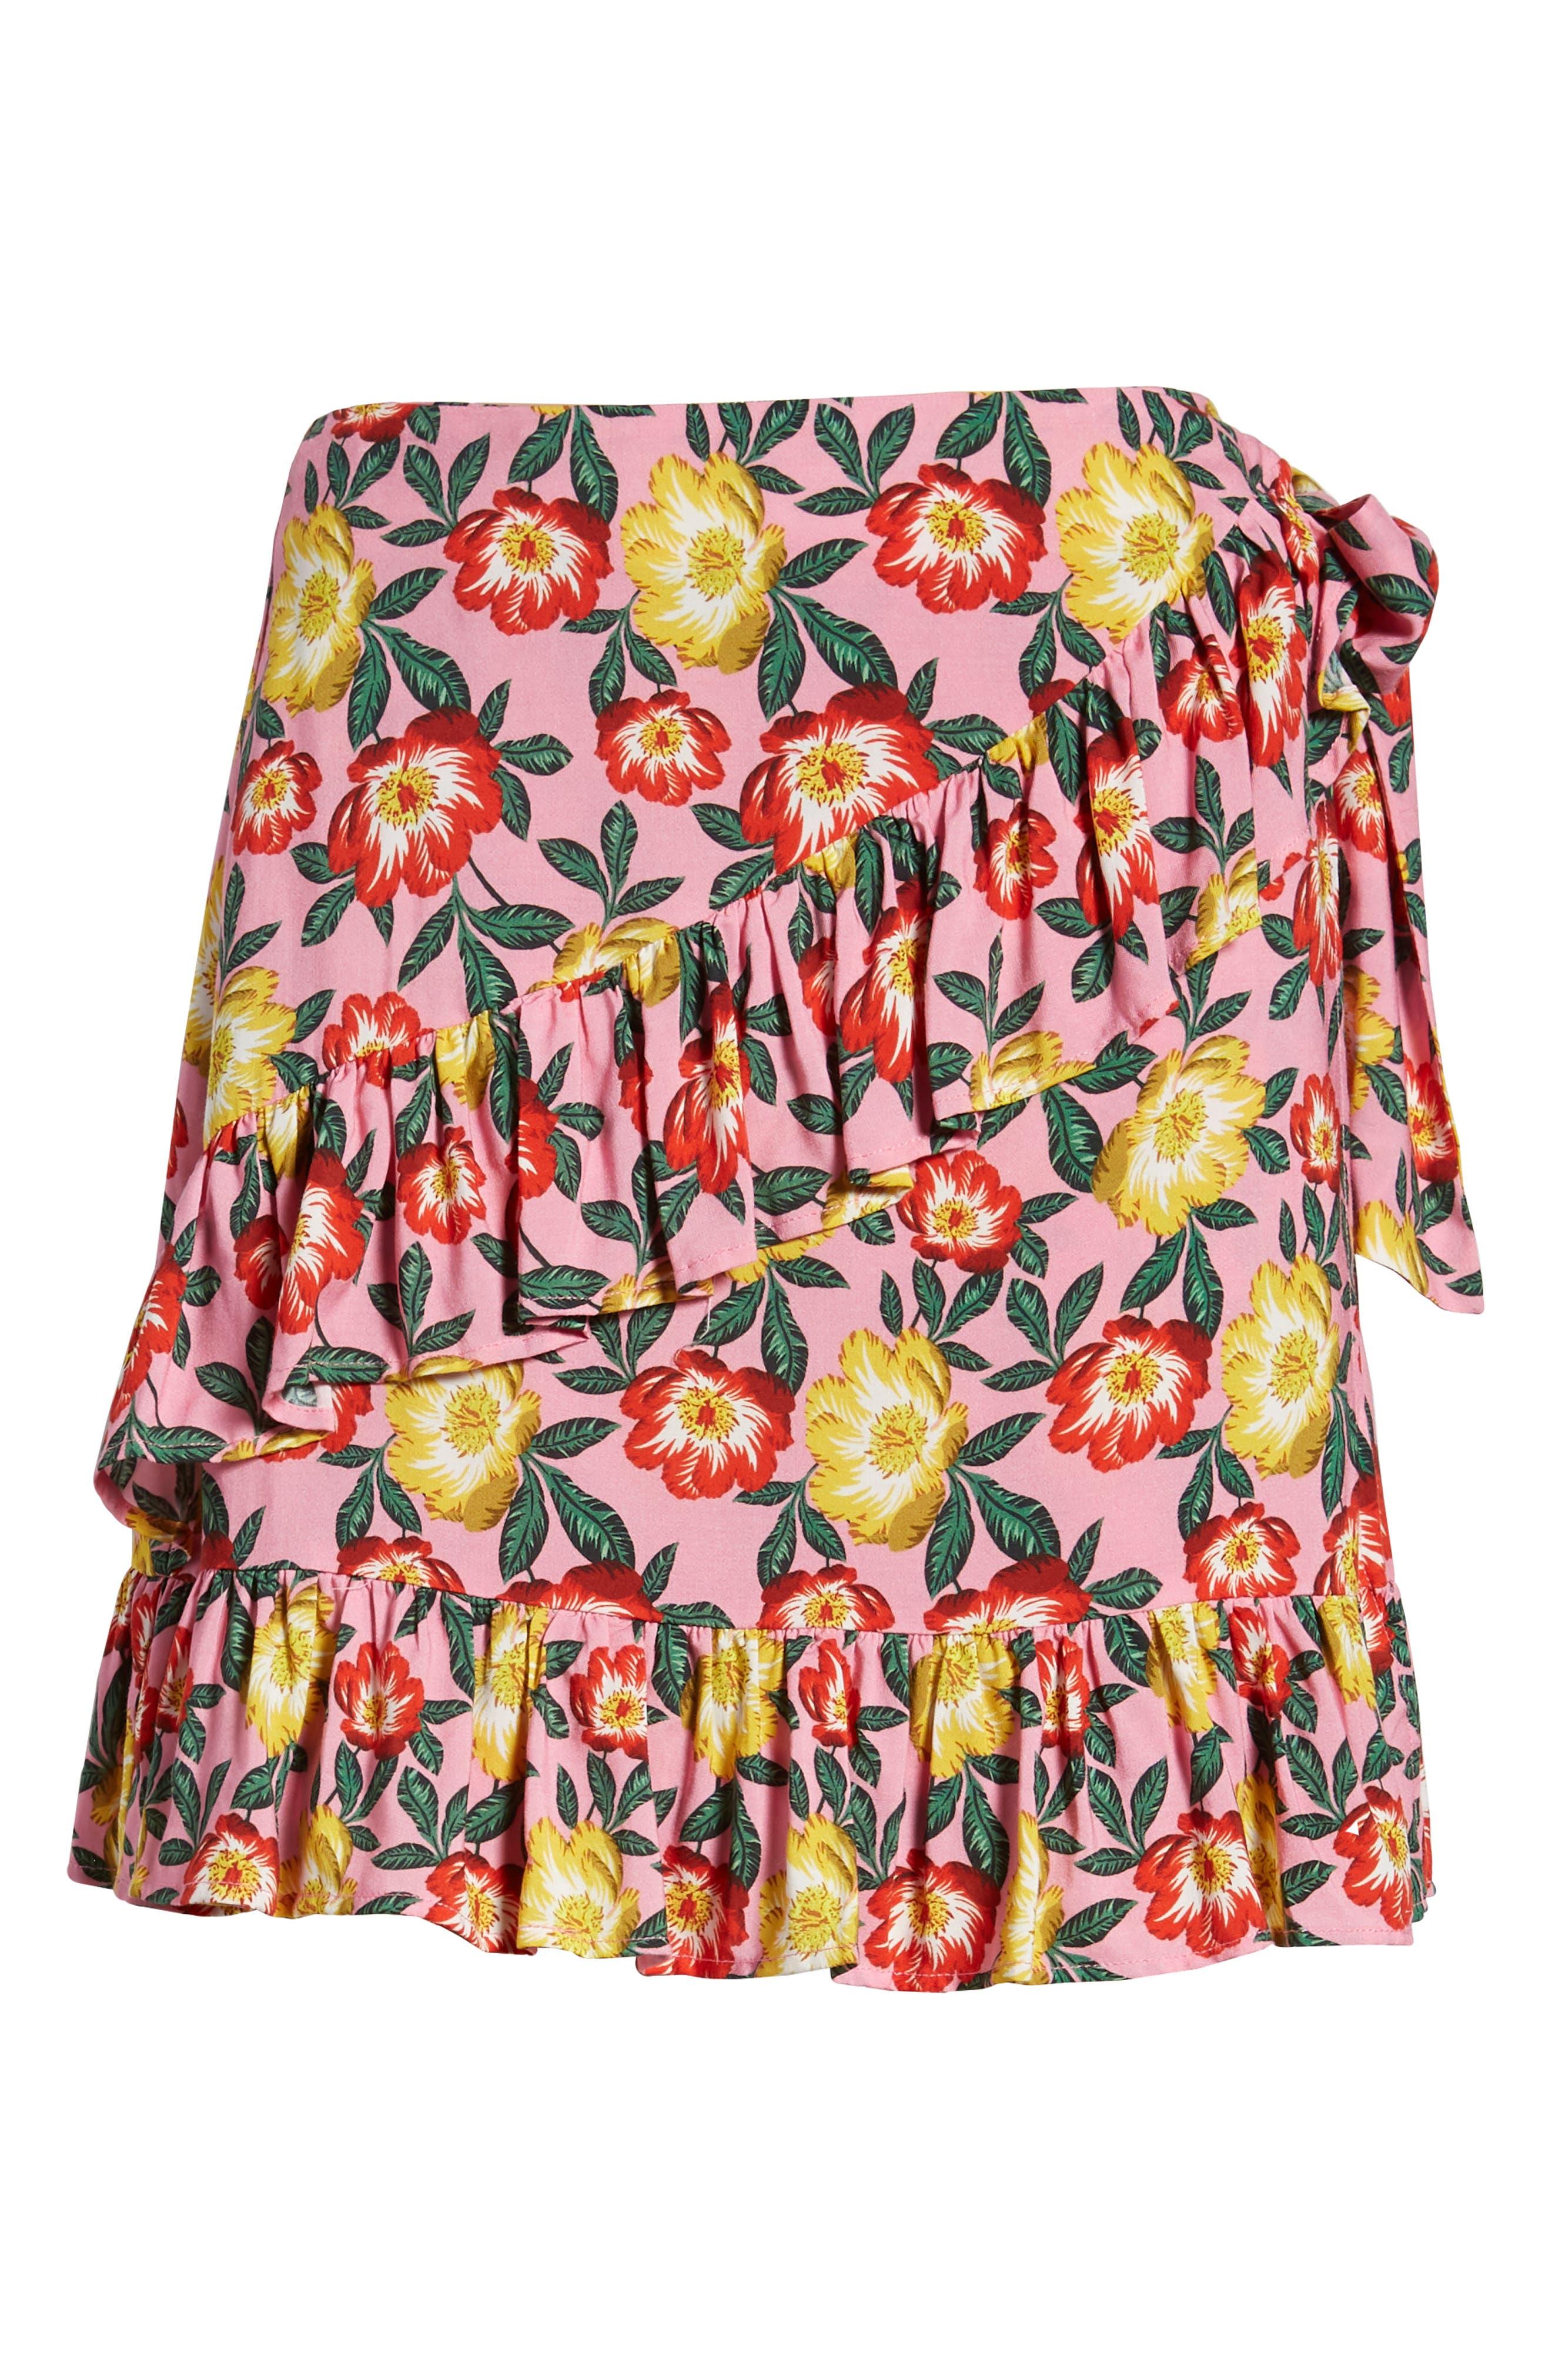 Reunion Floral Print Wrap Skirt,                             Alternate thumbnail 6, color,                             650